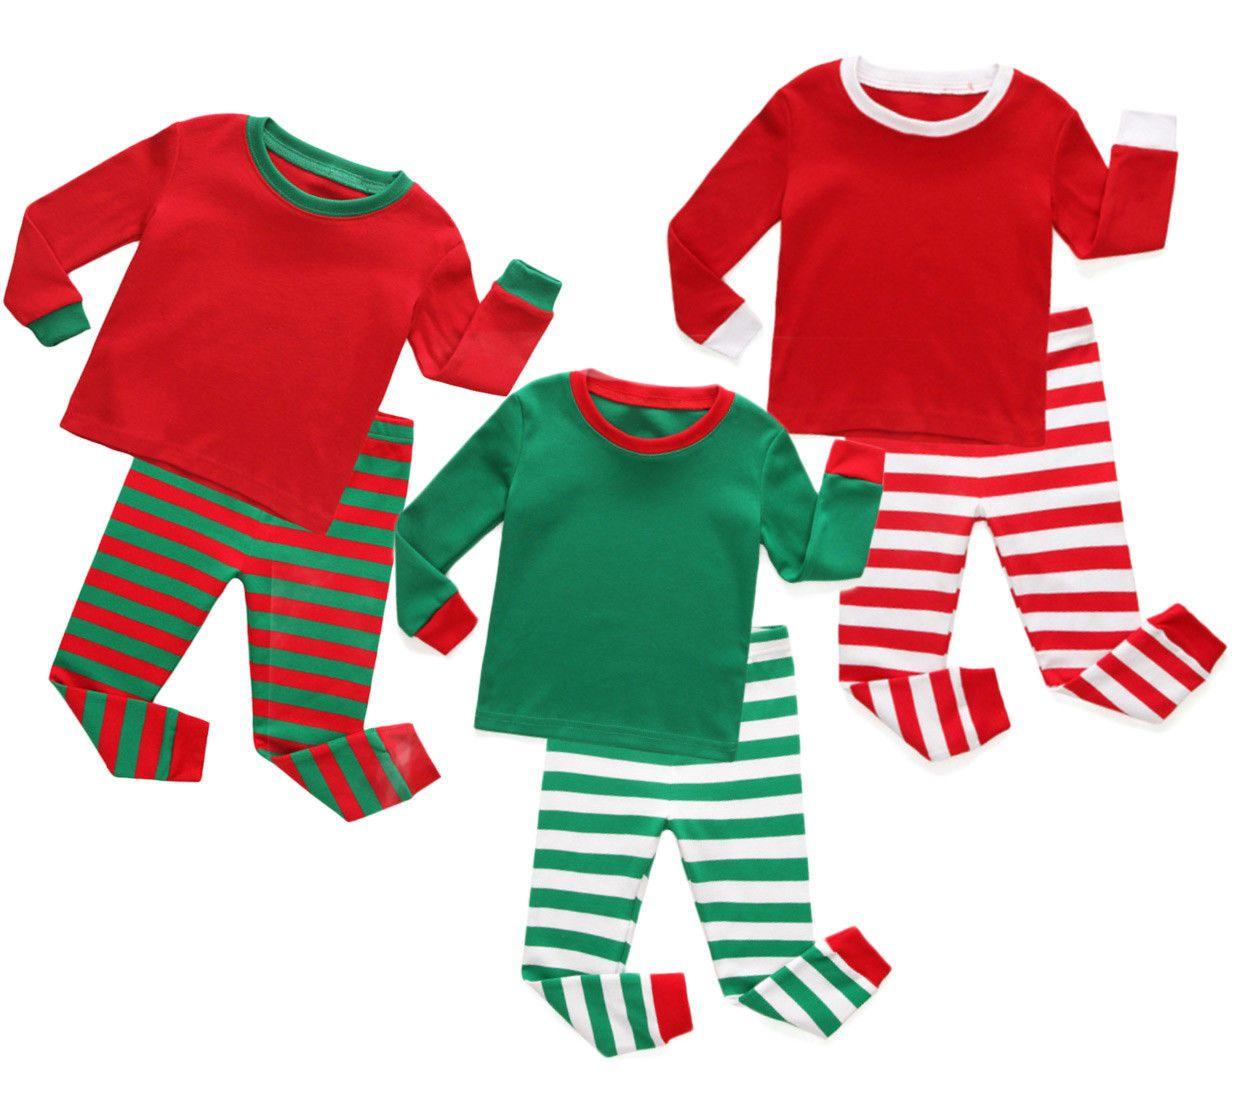 06eb20c33b Christmas Green Red Brother Sister Boys Girls Matching Strip Pajamas Lounge  Set